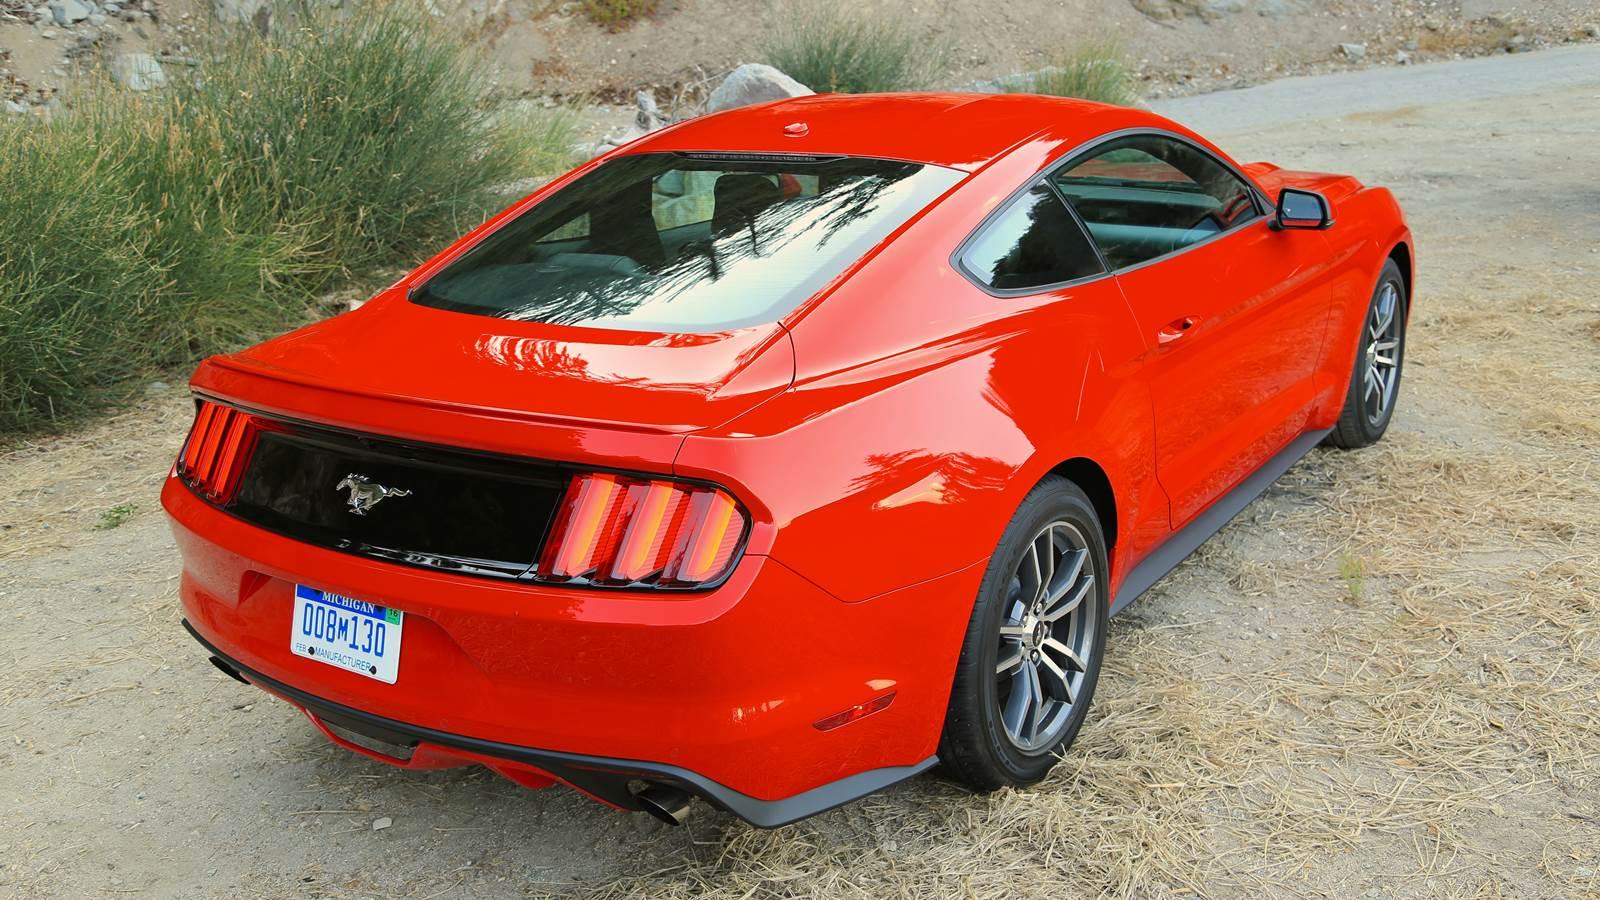 Novo Ford Mustang No Brasil Em 2016 Pre 231 O R 270 Mil